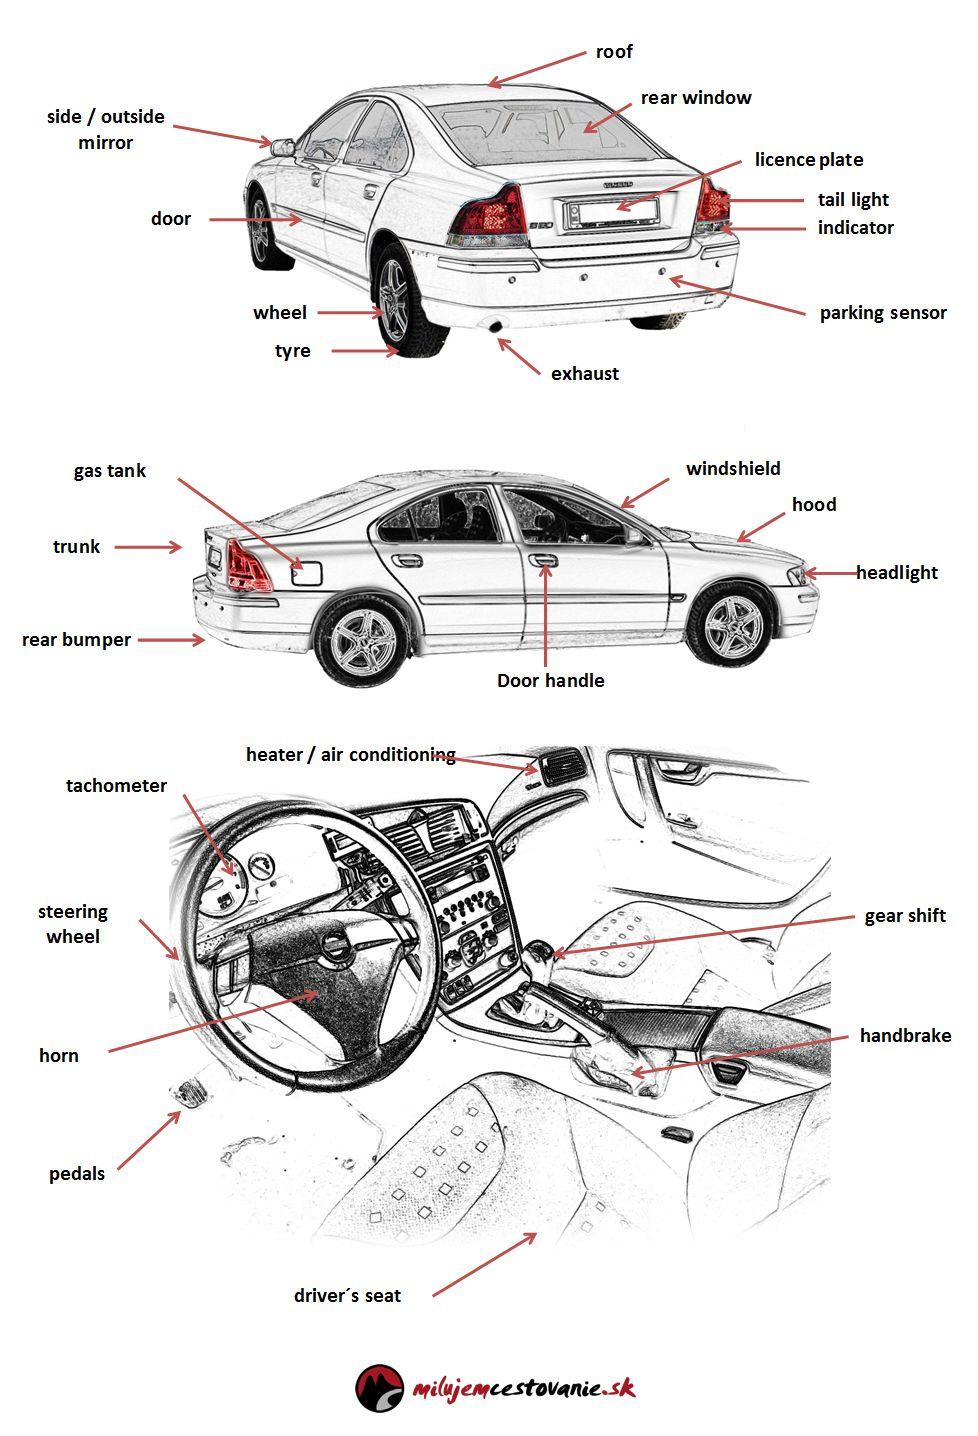 Partes de un auto exterior